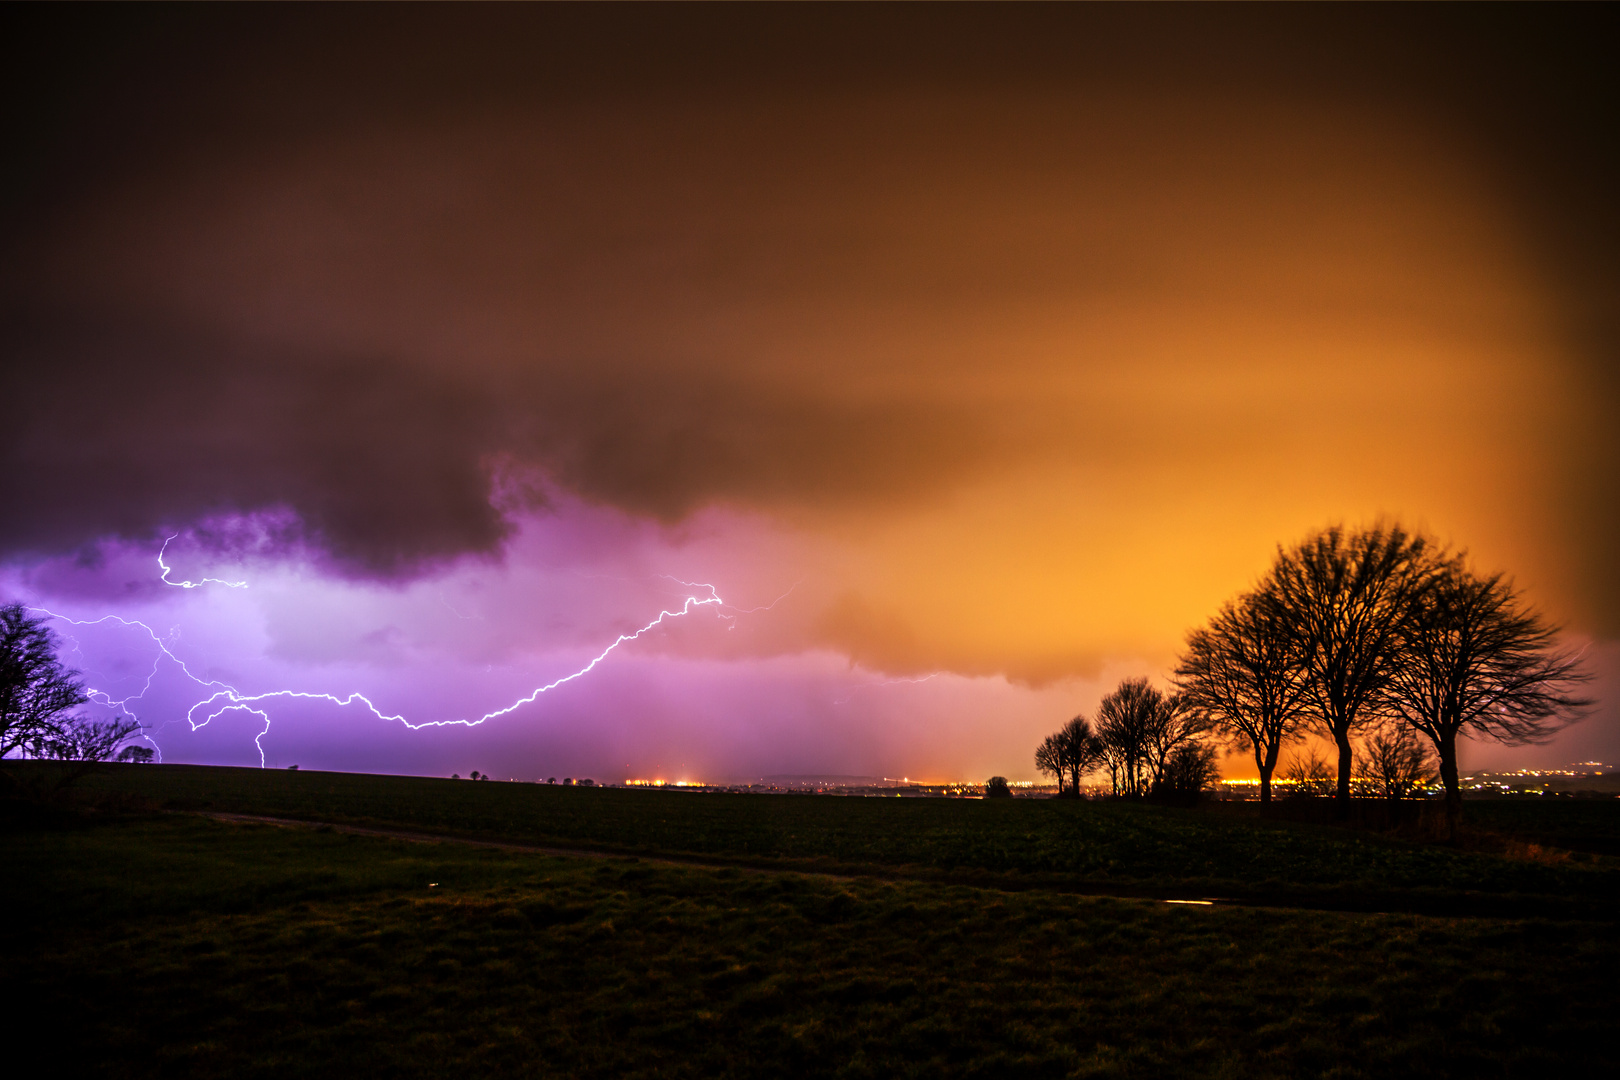 the first lightning